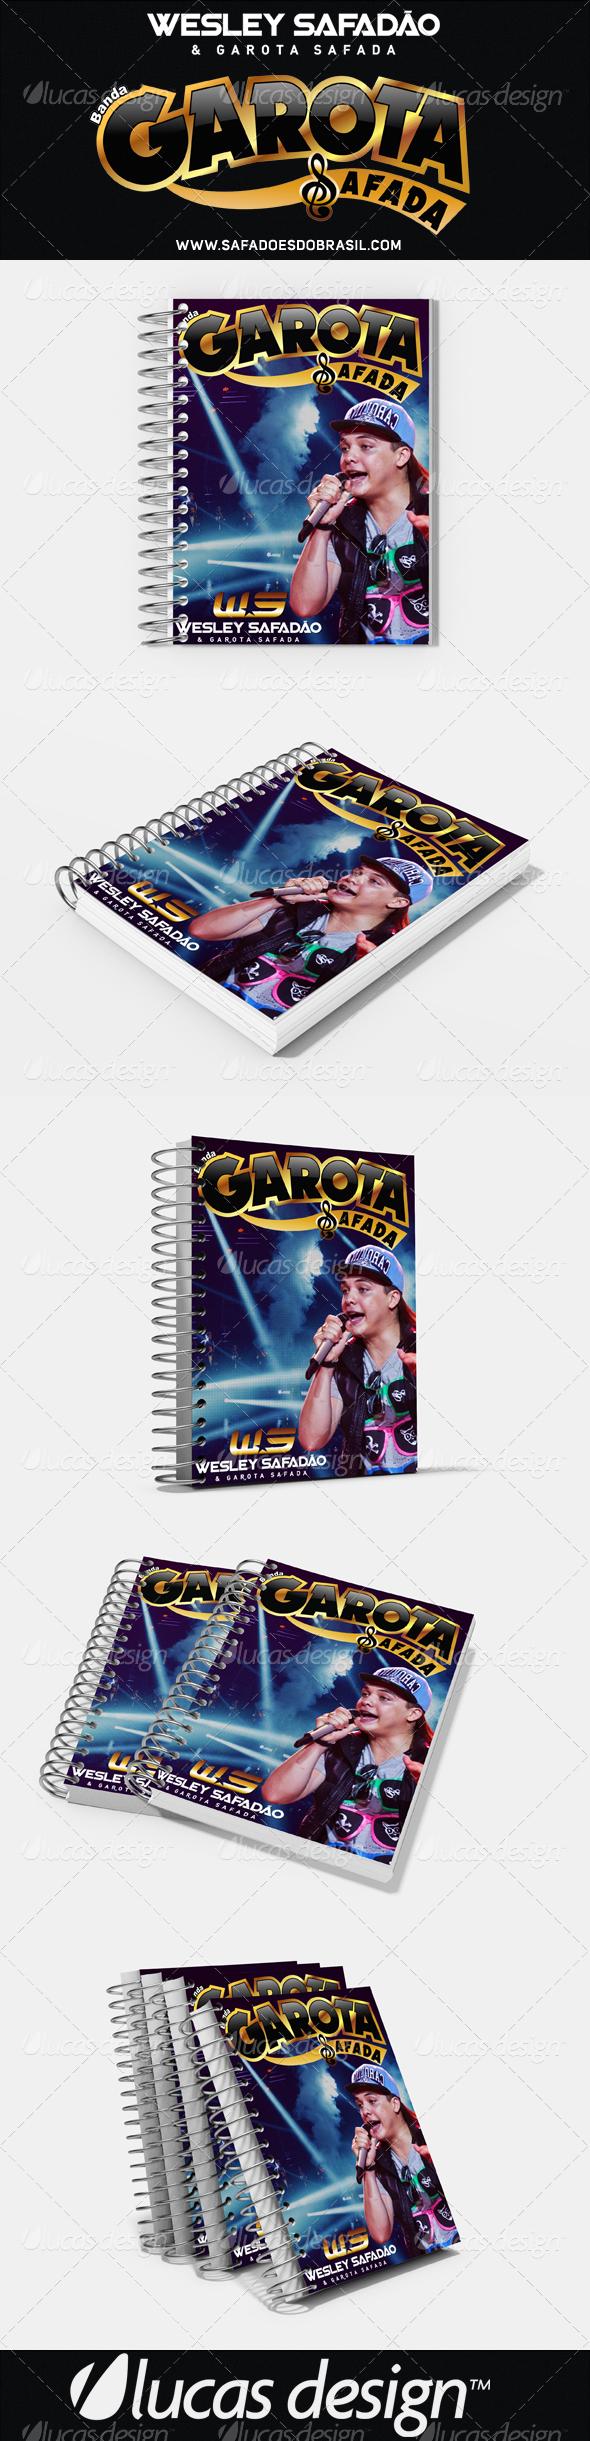 NoteBook Wesly Safadão & Garota Safada - @LuccaAlexandre